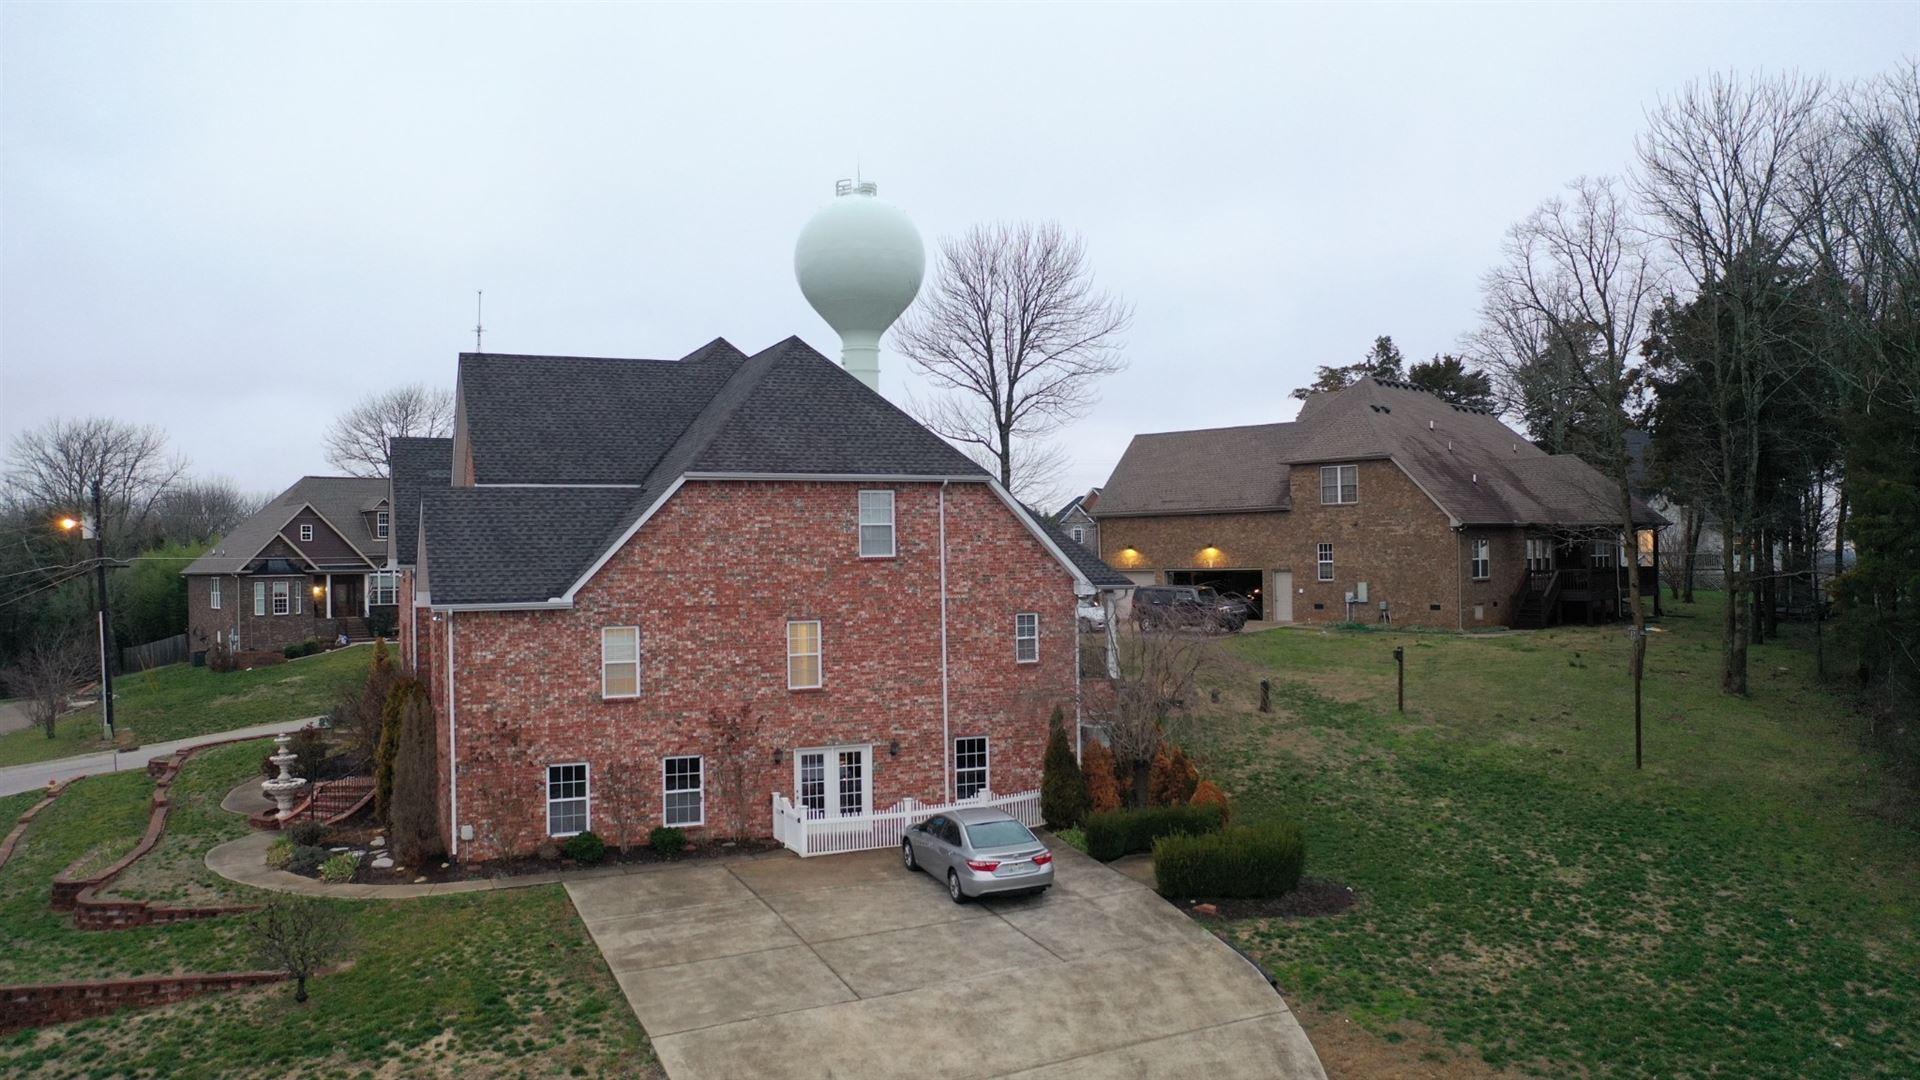 Photo of 1674 Allendale Dr, Nolensville, TN 37135 (MLS # 2216951)